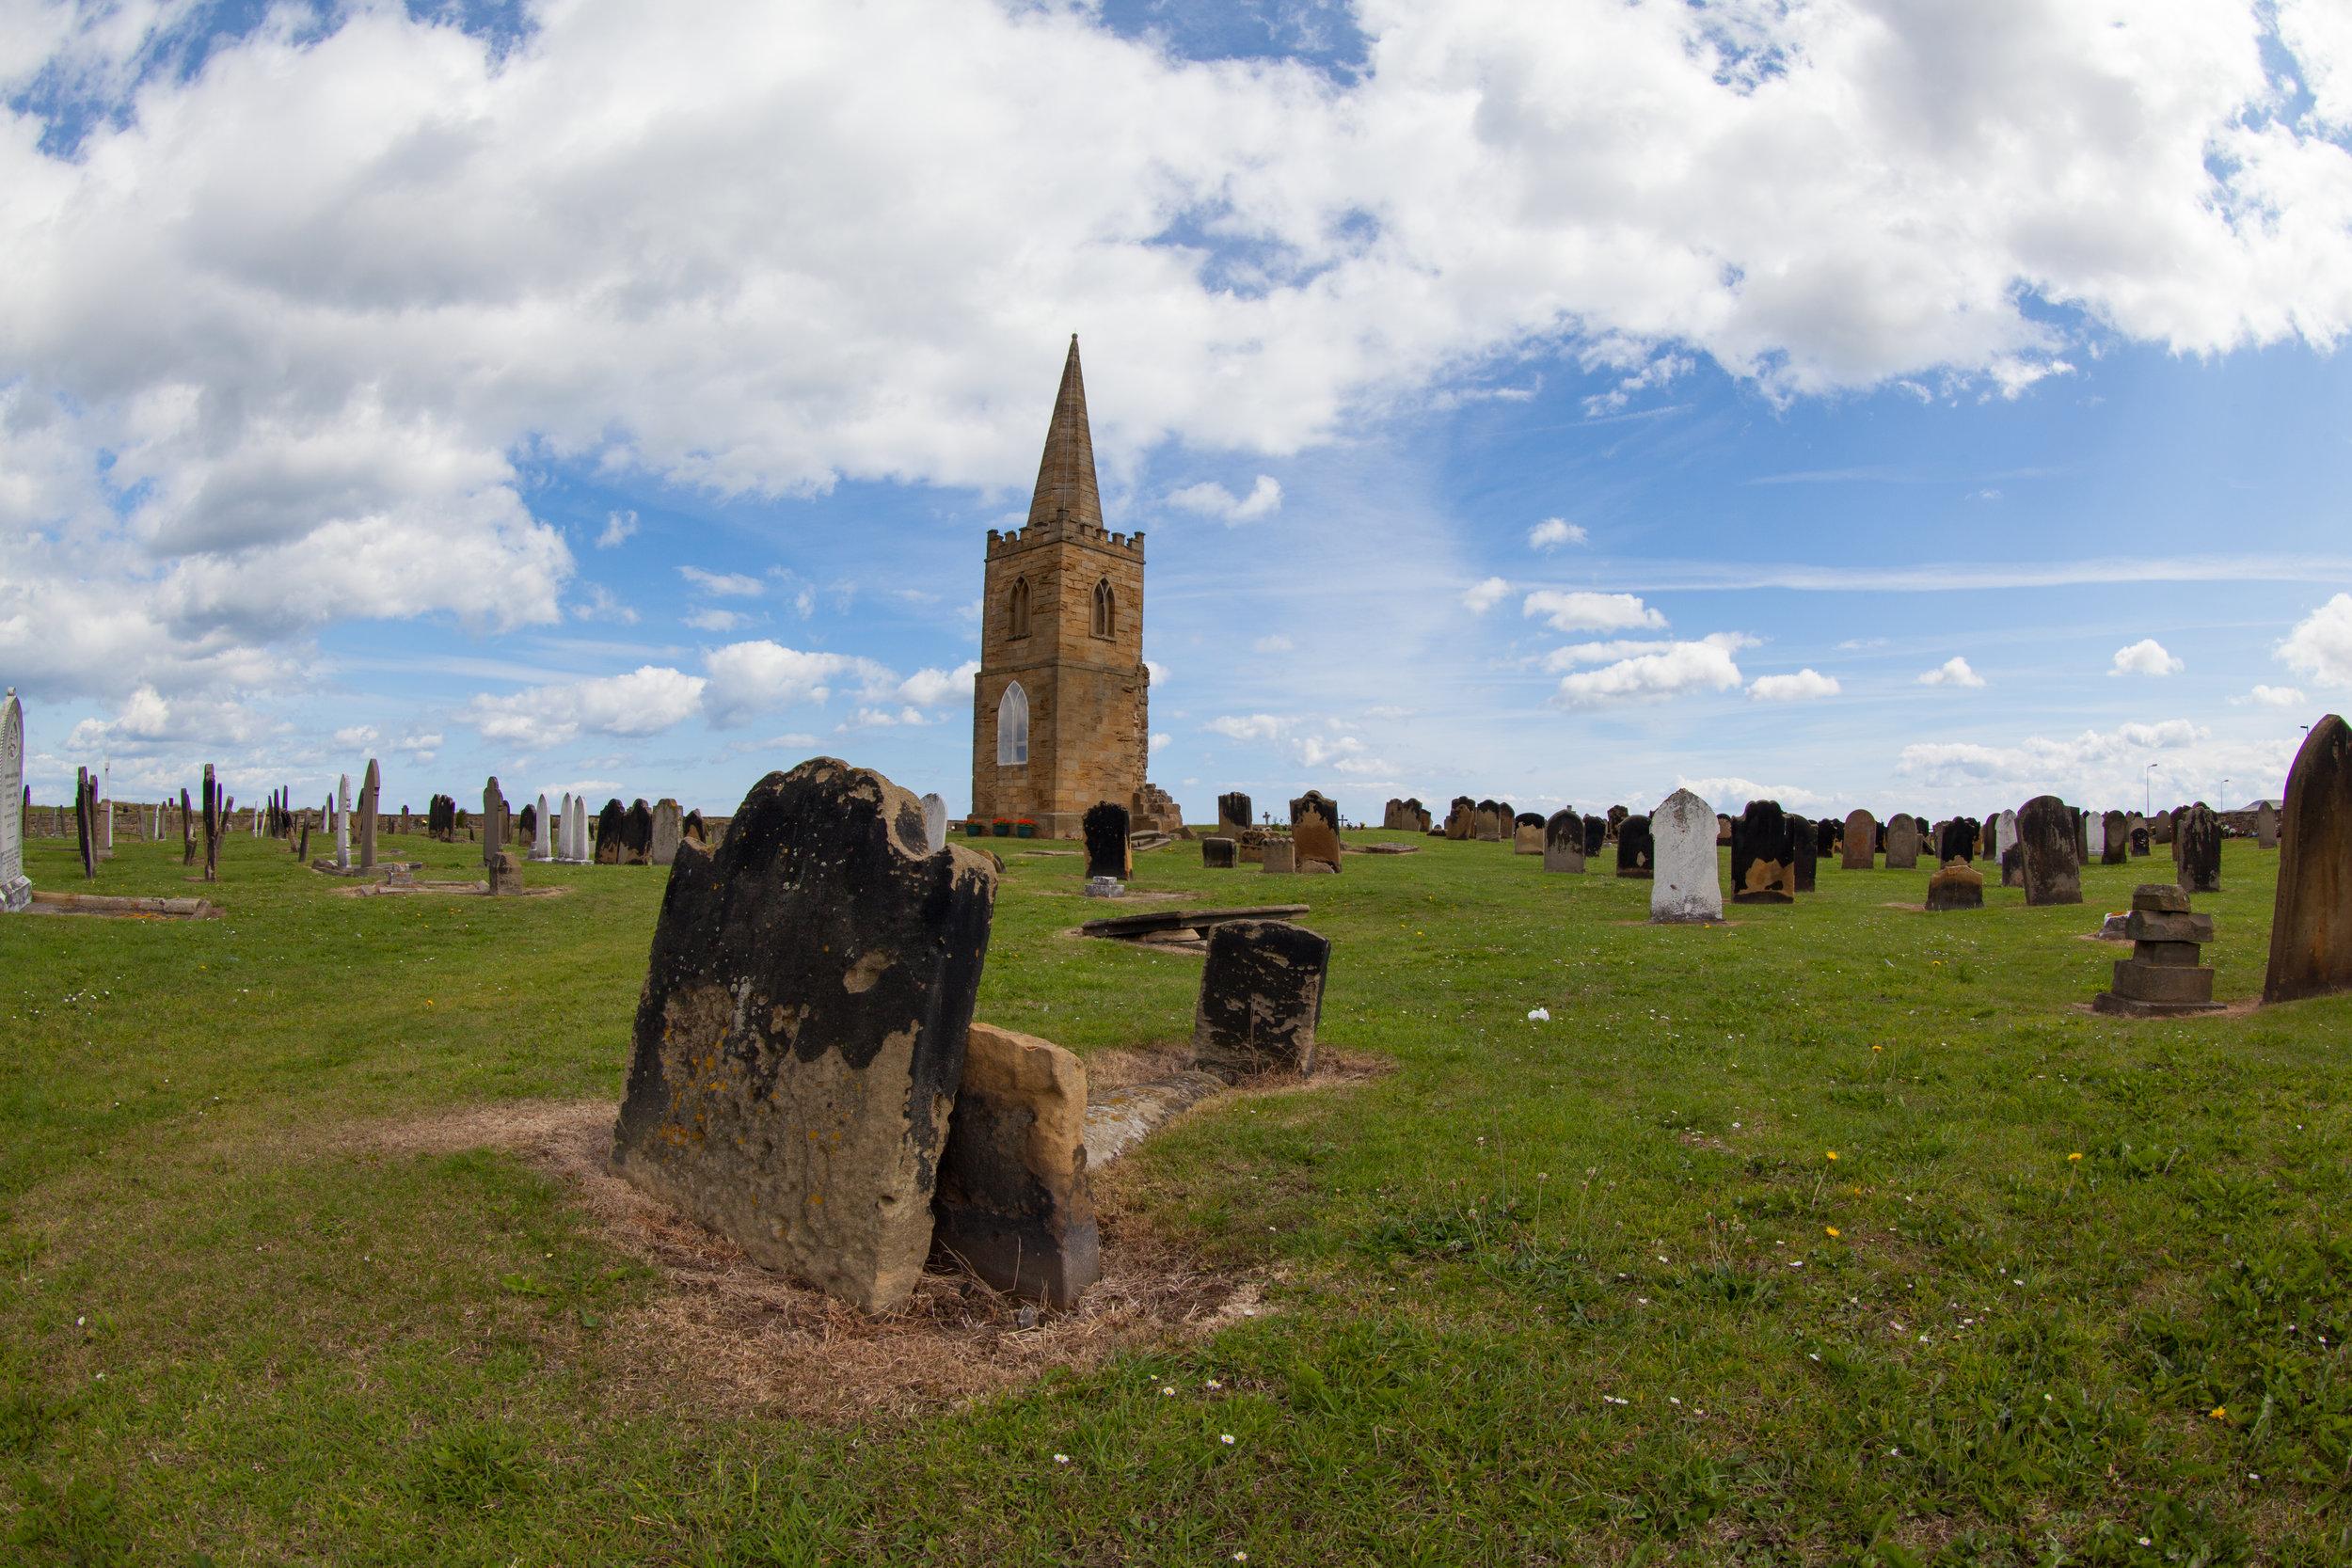 A church and graveyard.